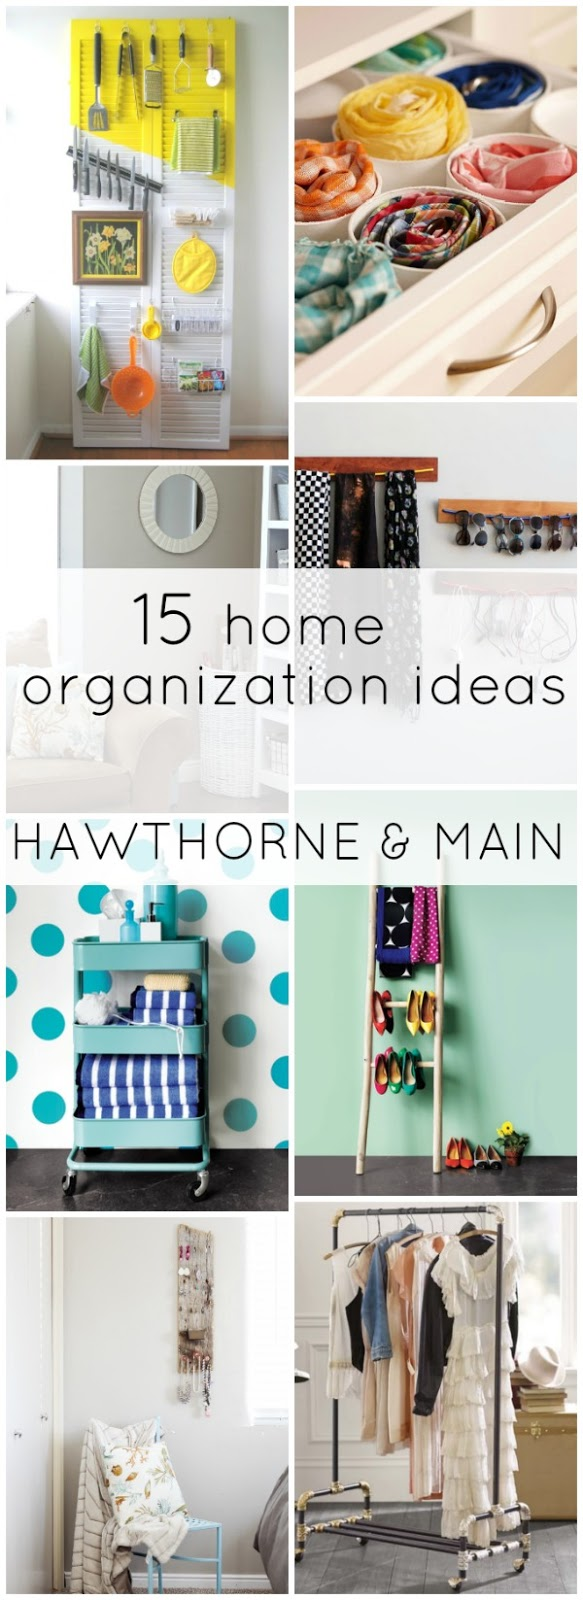 15 Home Organization Ideas – HAWTHORNE AND MAIN